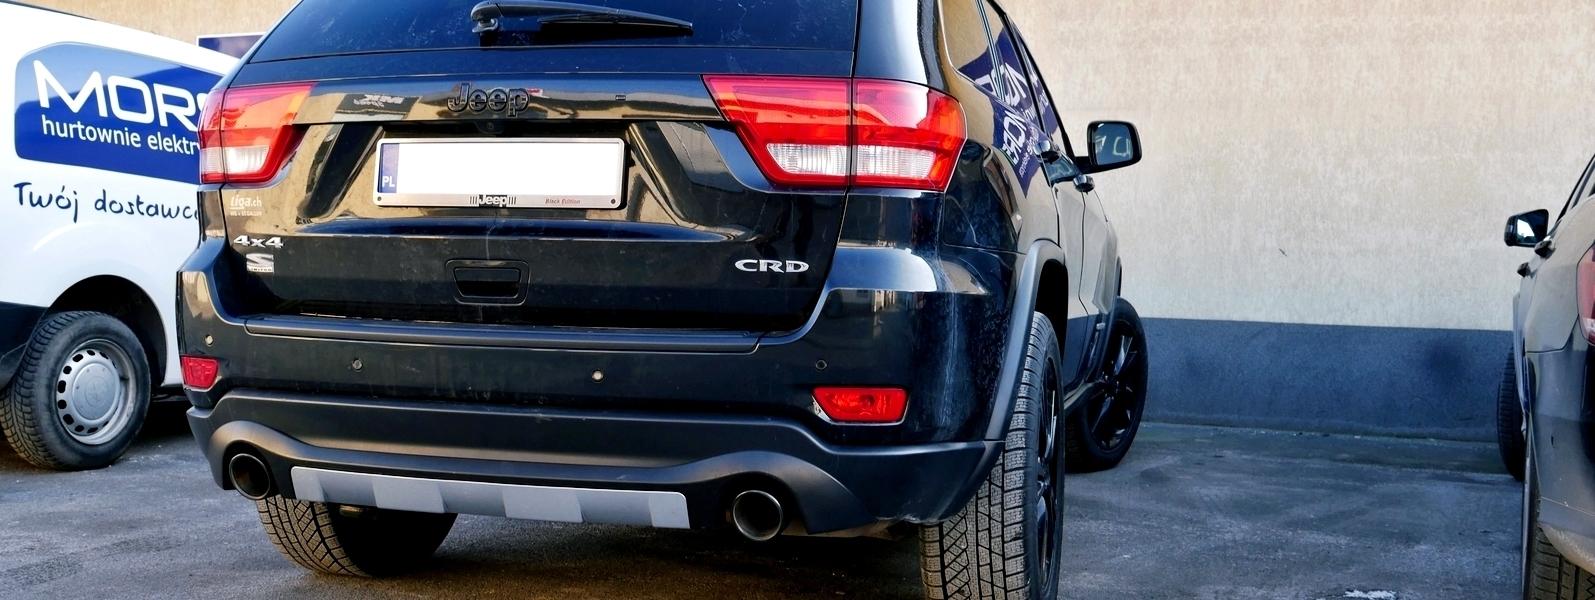 jeep-grand-cherokee-maxhaust